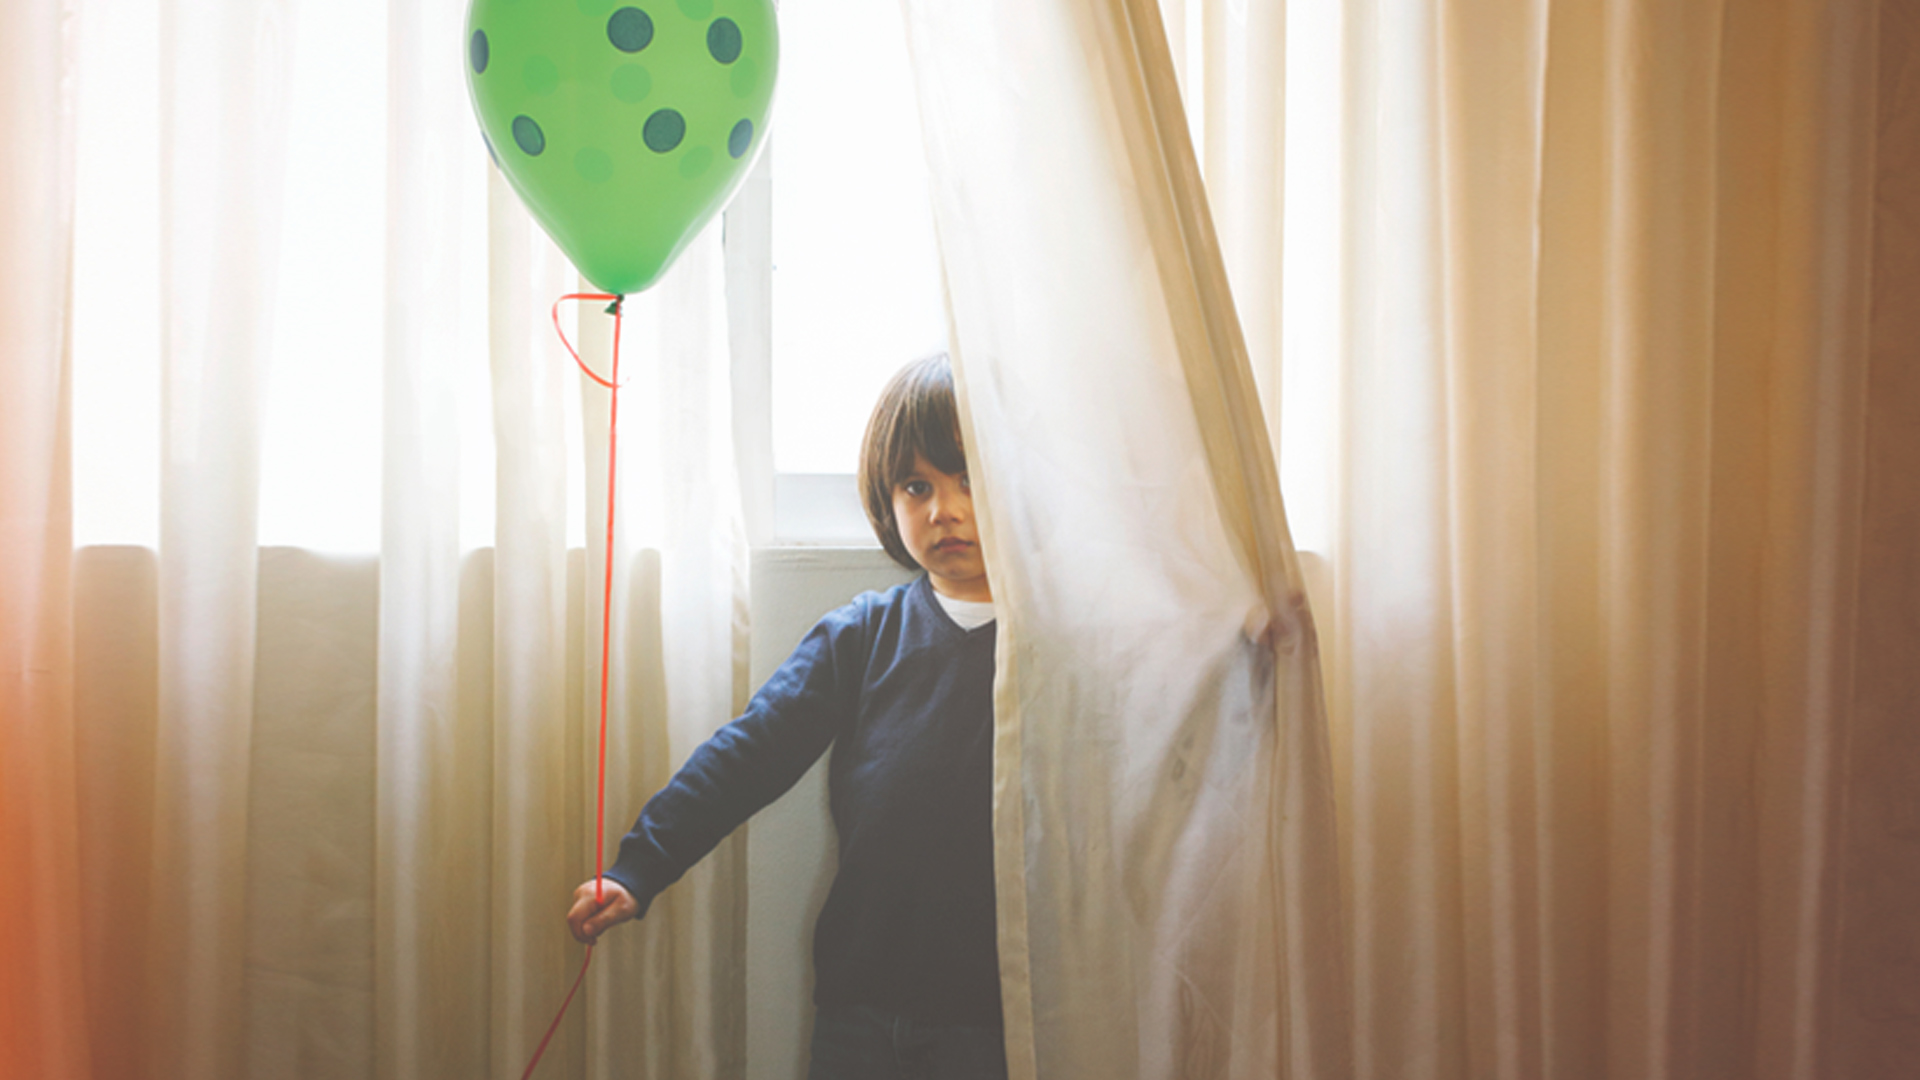 Boy hiding behind curtain holding a balloon in his hand